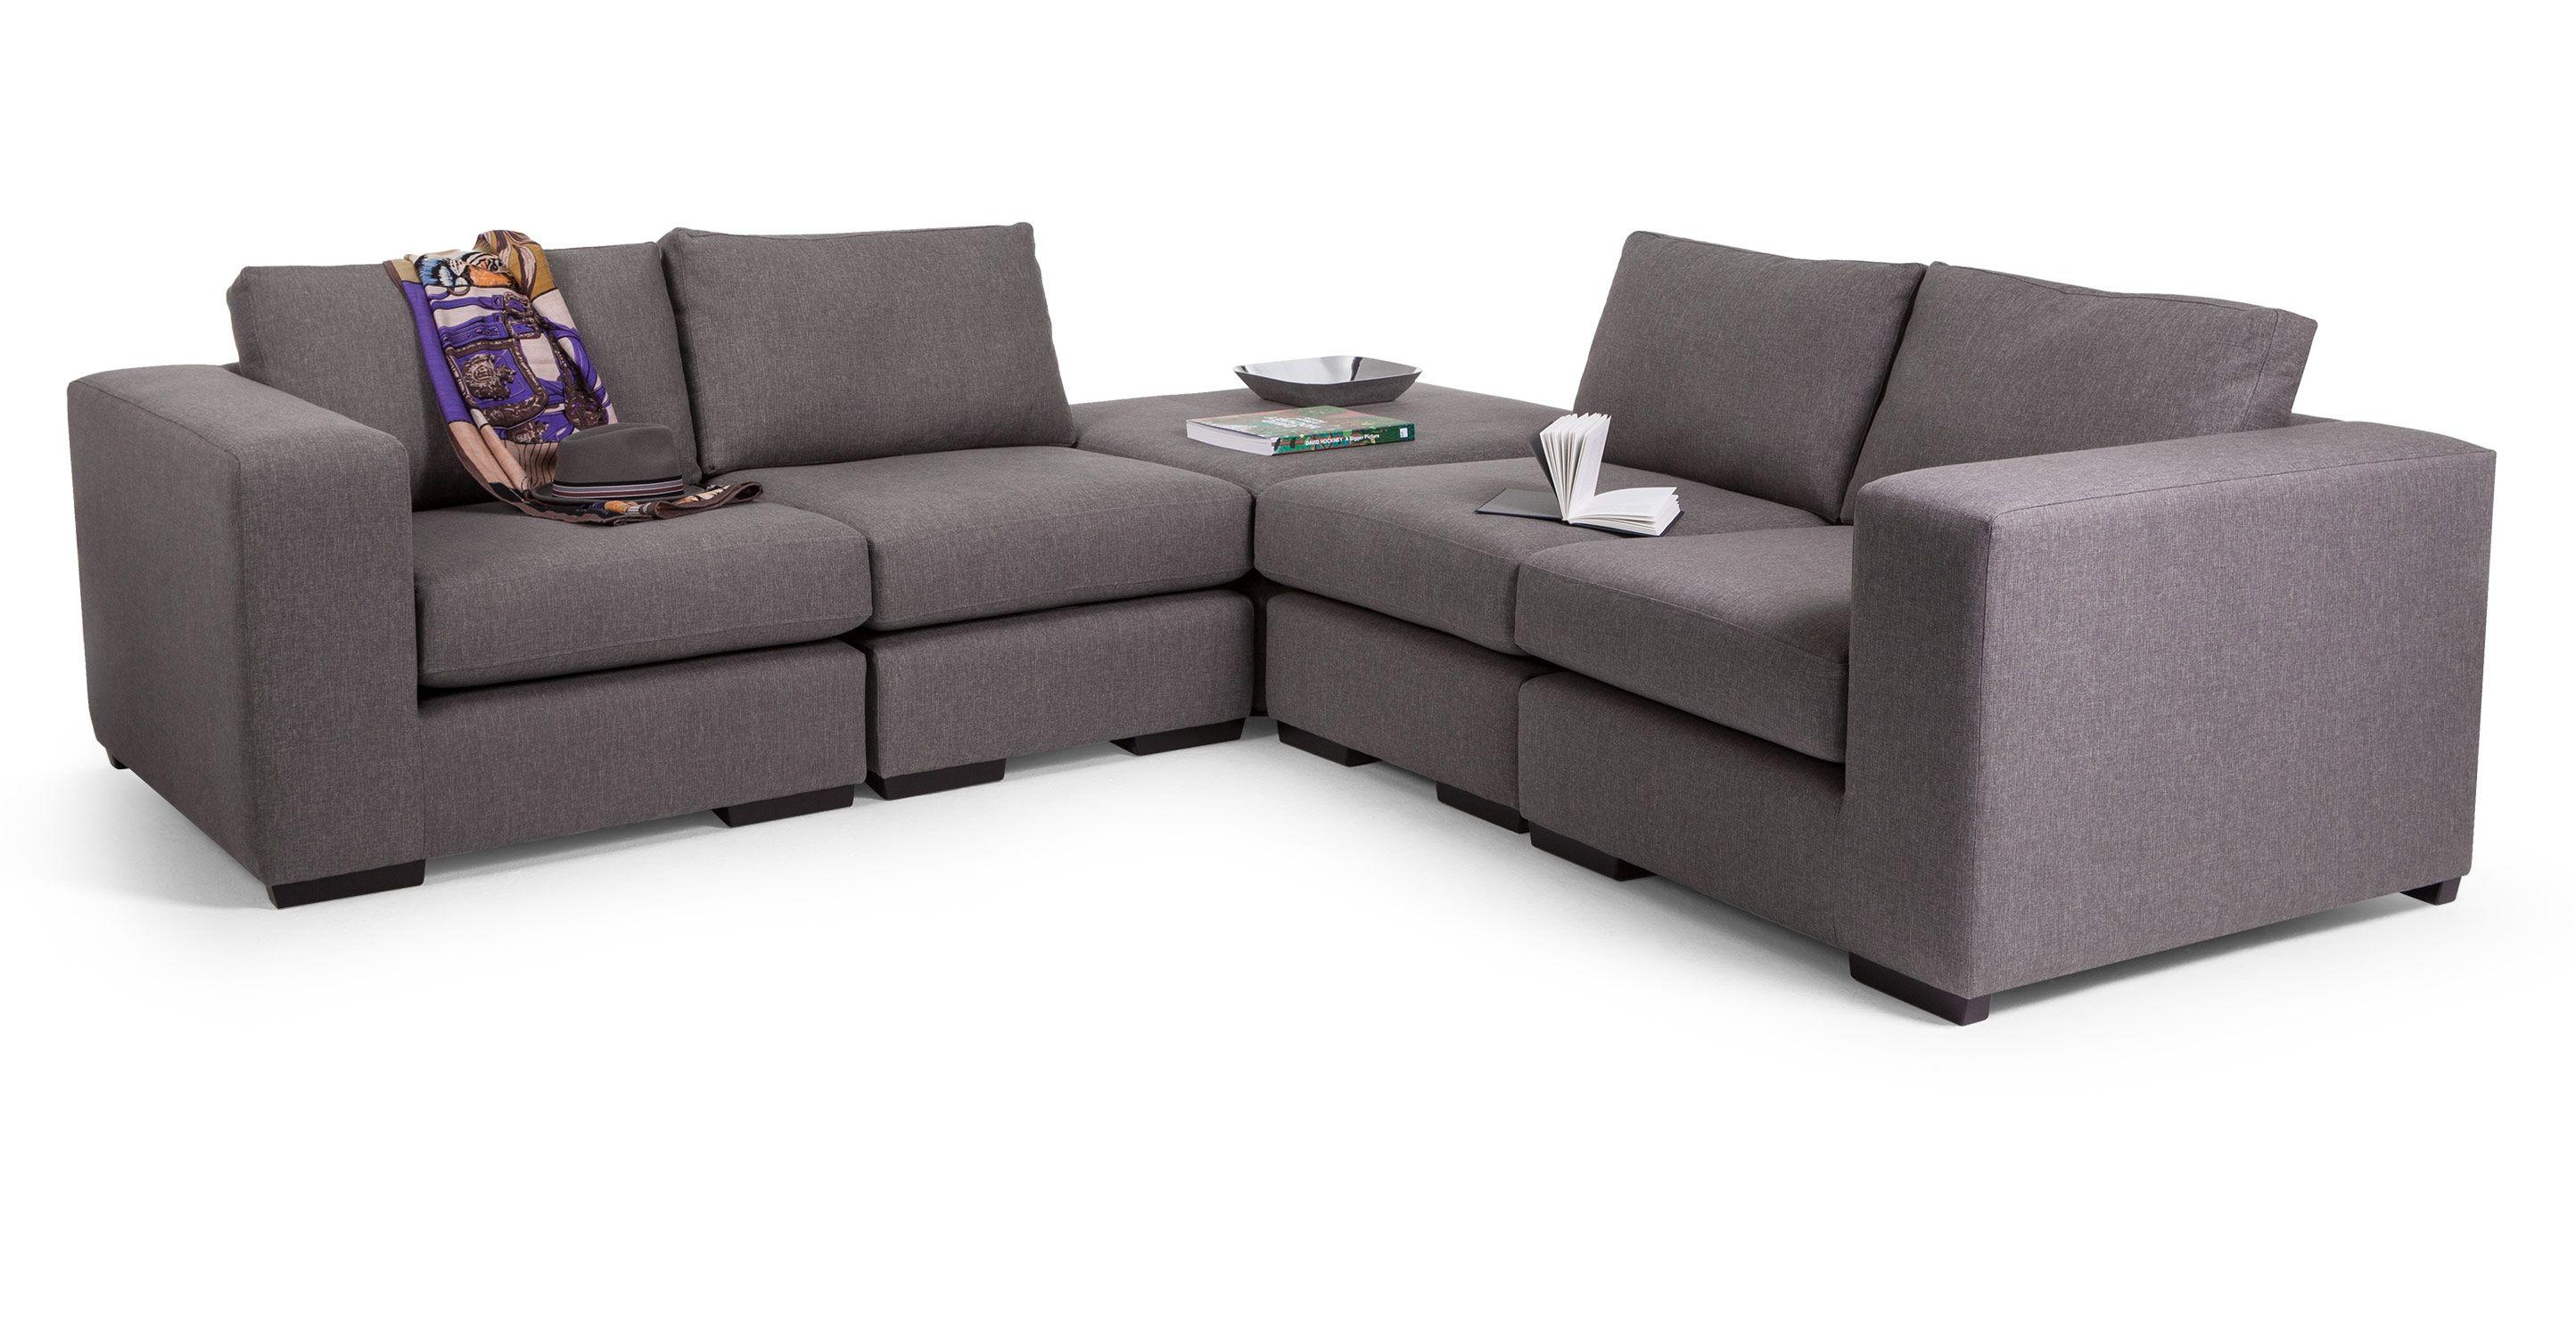 Delightful Small Modular Corner Sofa , Lovely Small